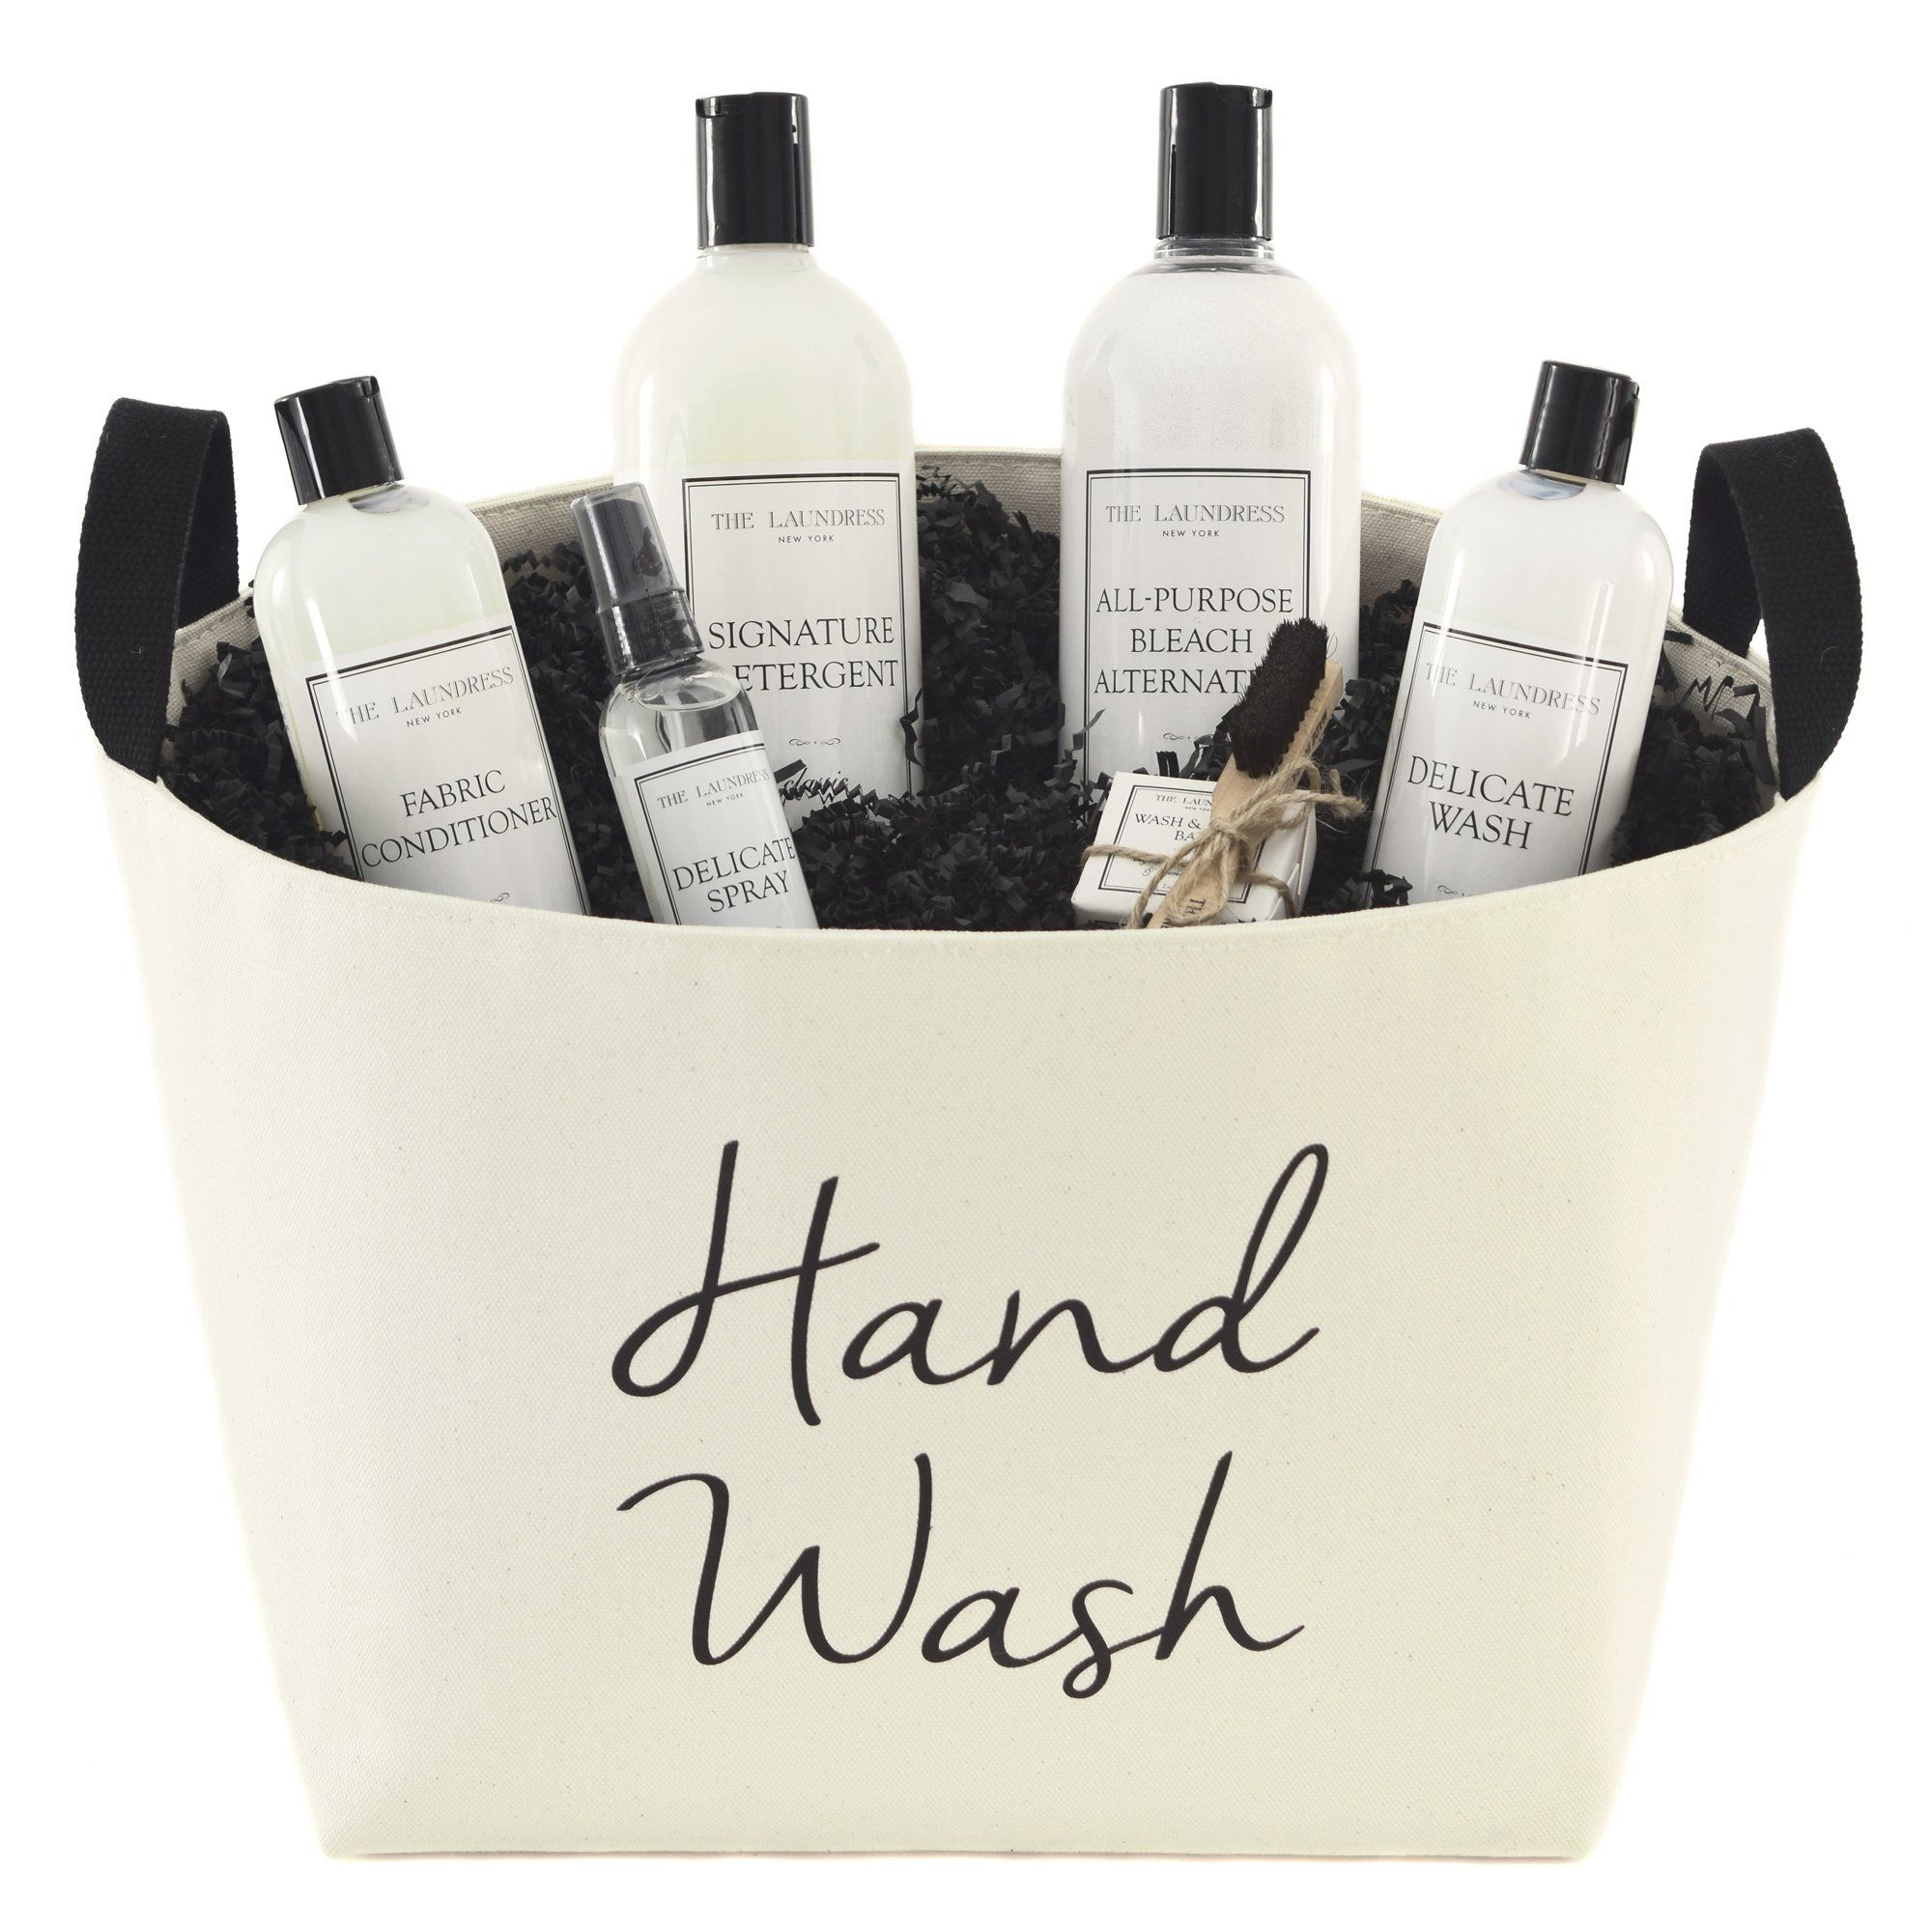 Hand Wash Gift Basket Delicate Wash Gift Baskets Gifts